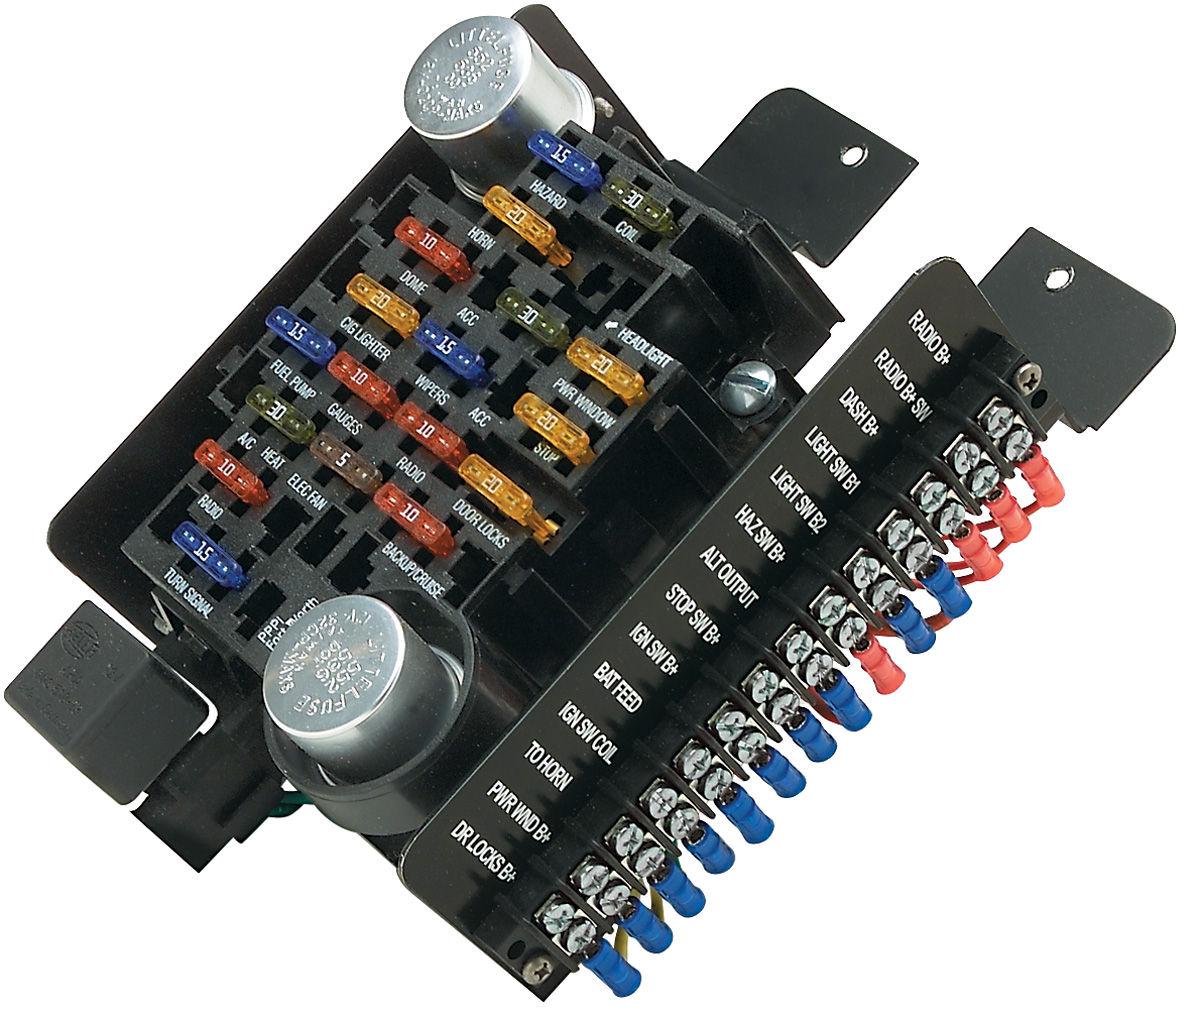 fuse box 1985 el camino ss choo choo custom simple wiring diagram rh 58 lodge finder de 79 cutlass 85 cutlass fuse box [ 1200 x 1022 Pixel ]